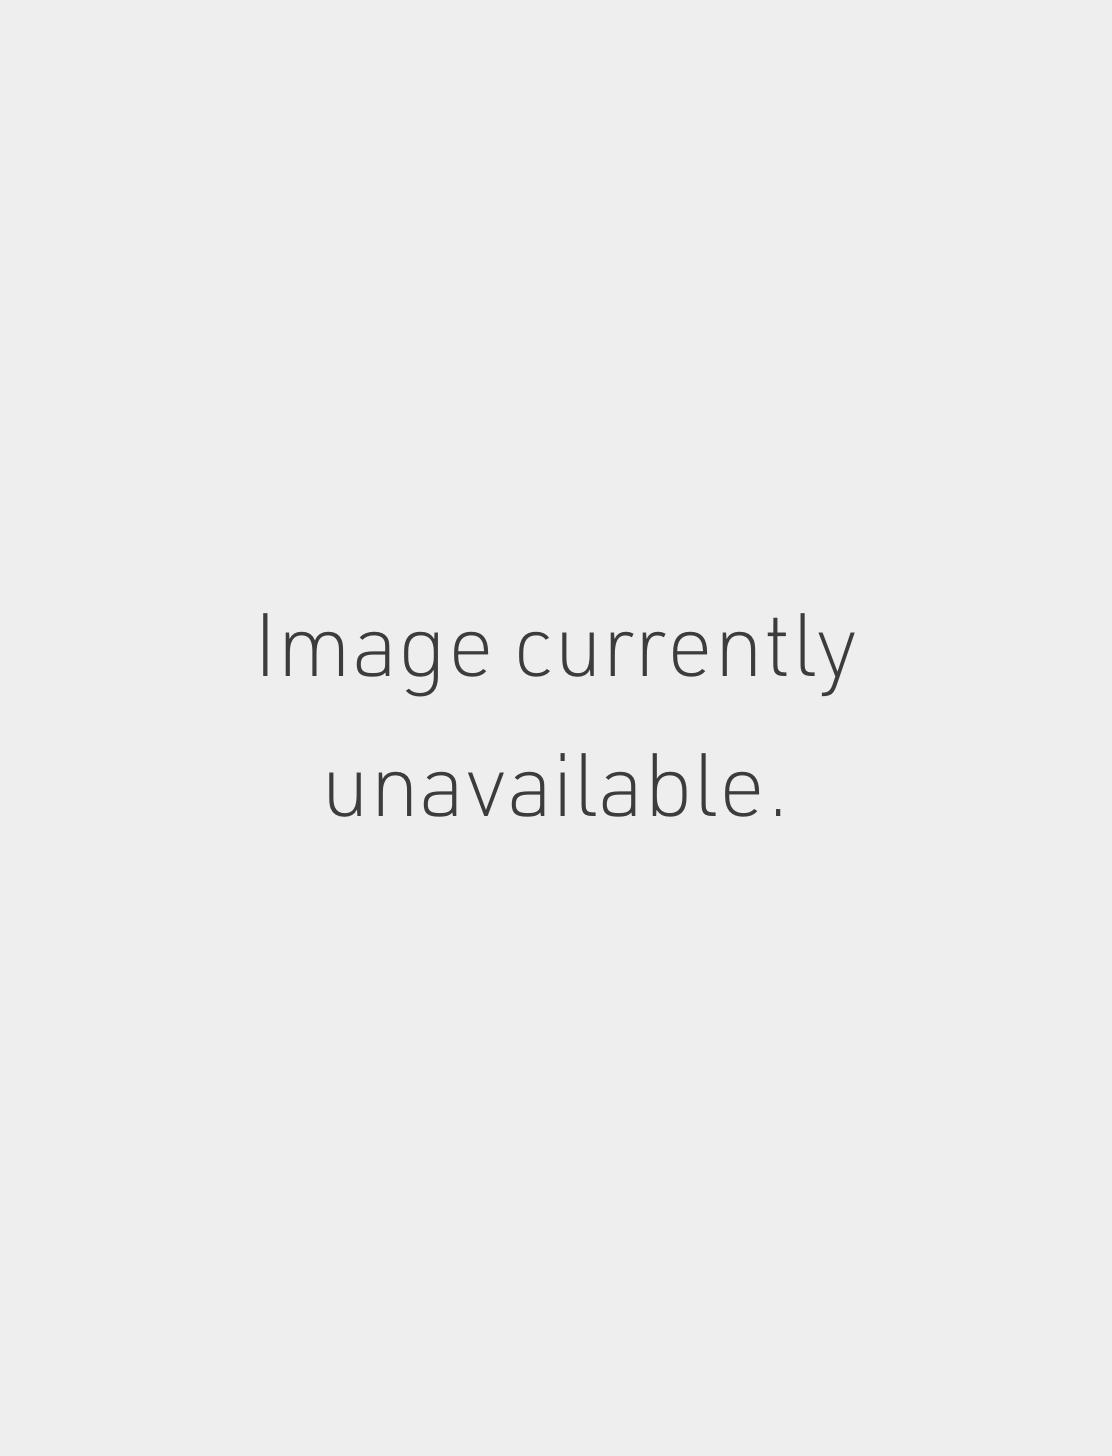 9.5mm 3mm Diamond Princess Trillion Ring Image #1